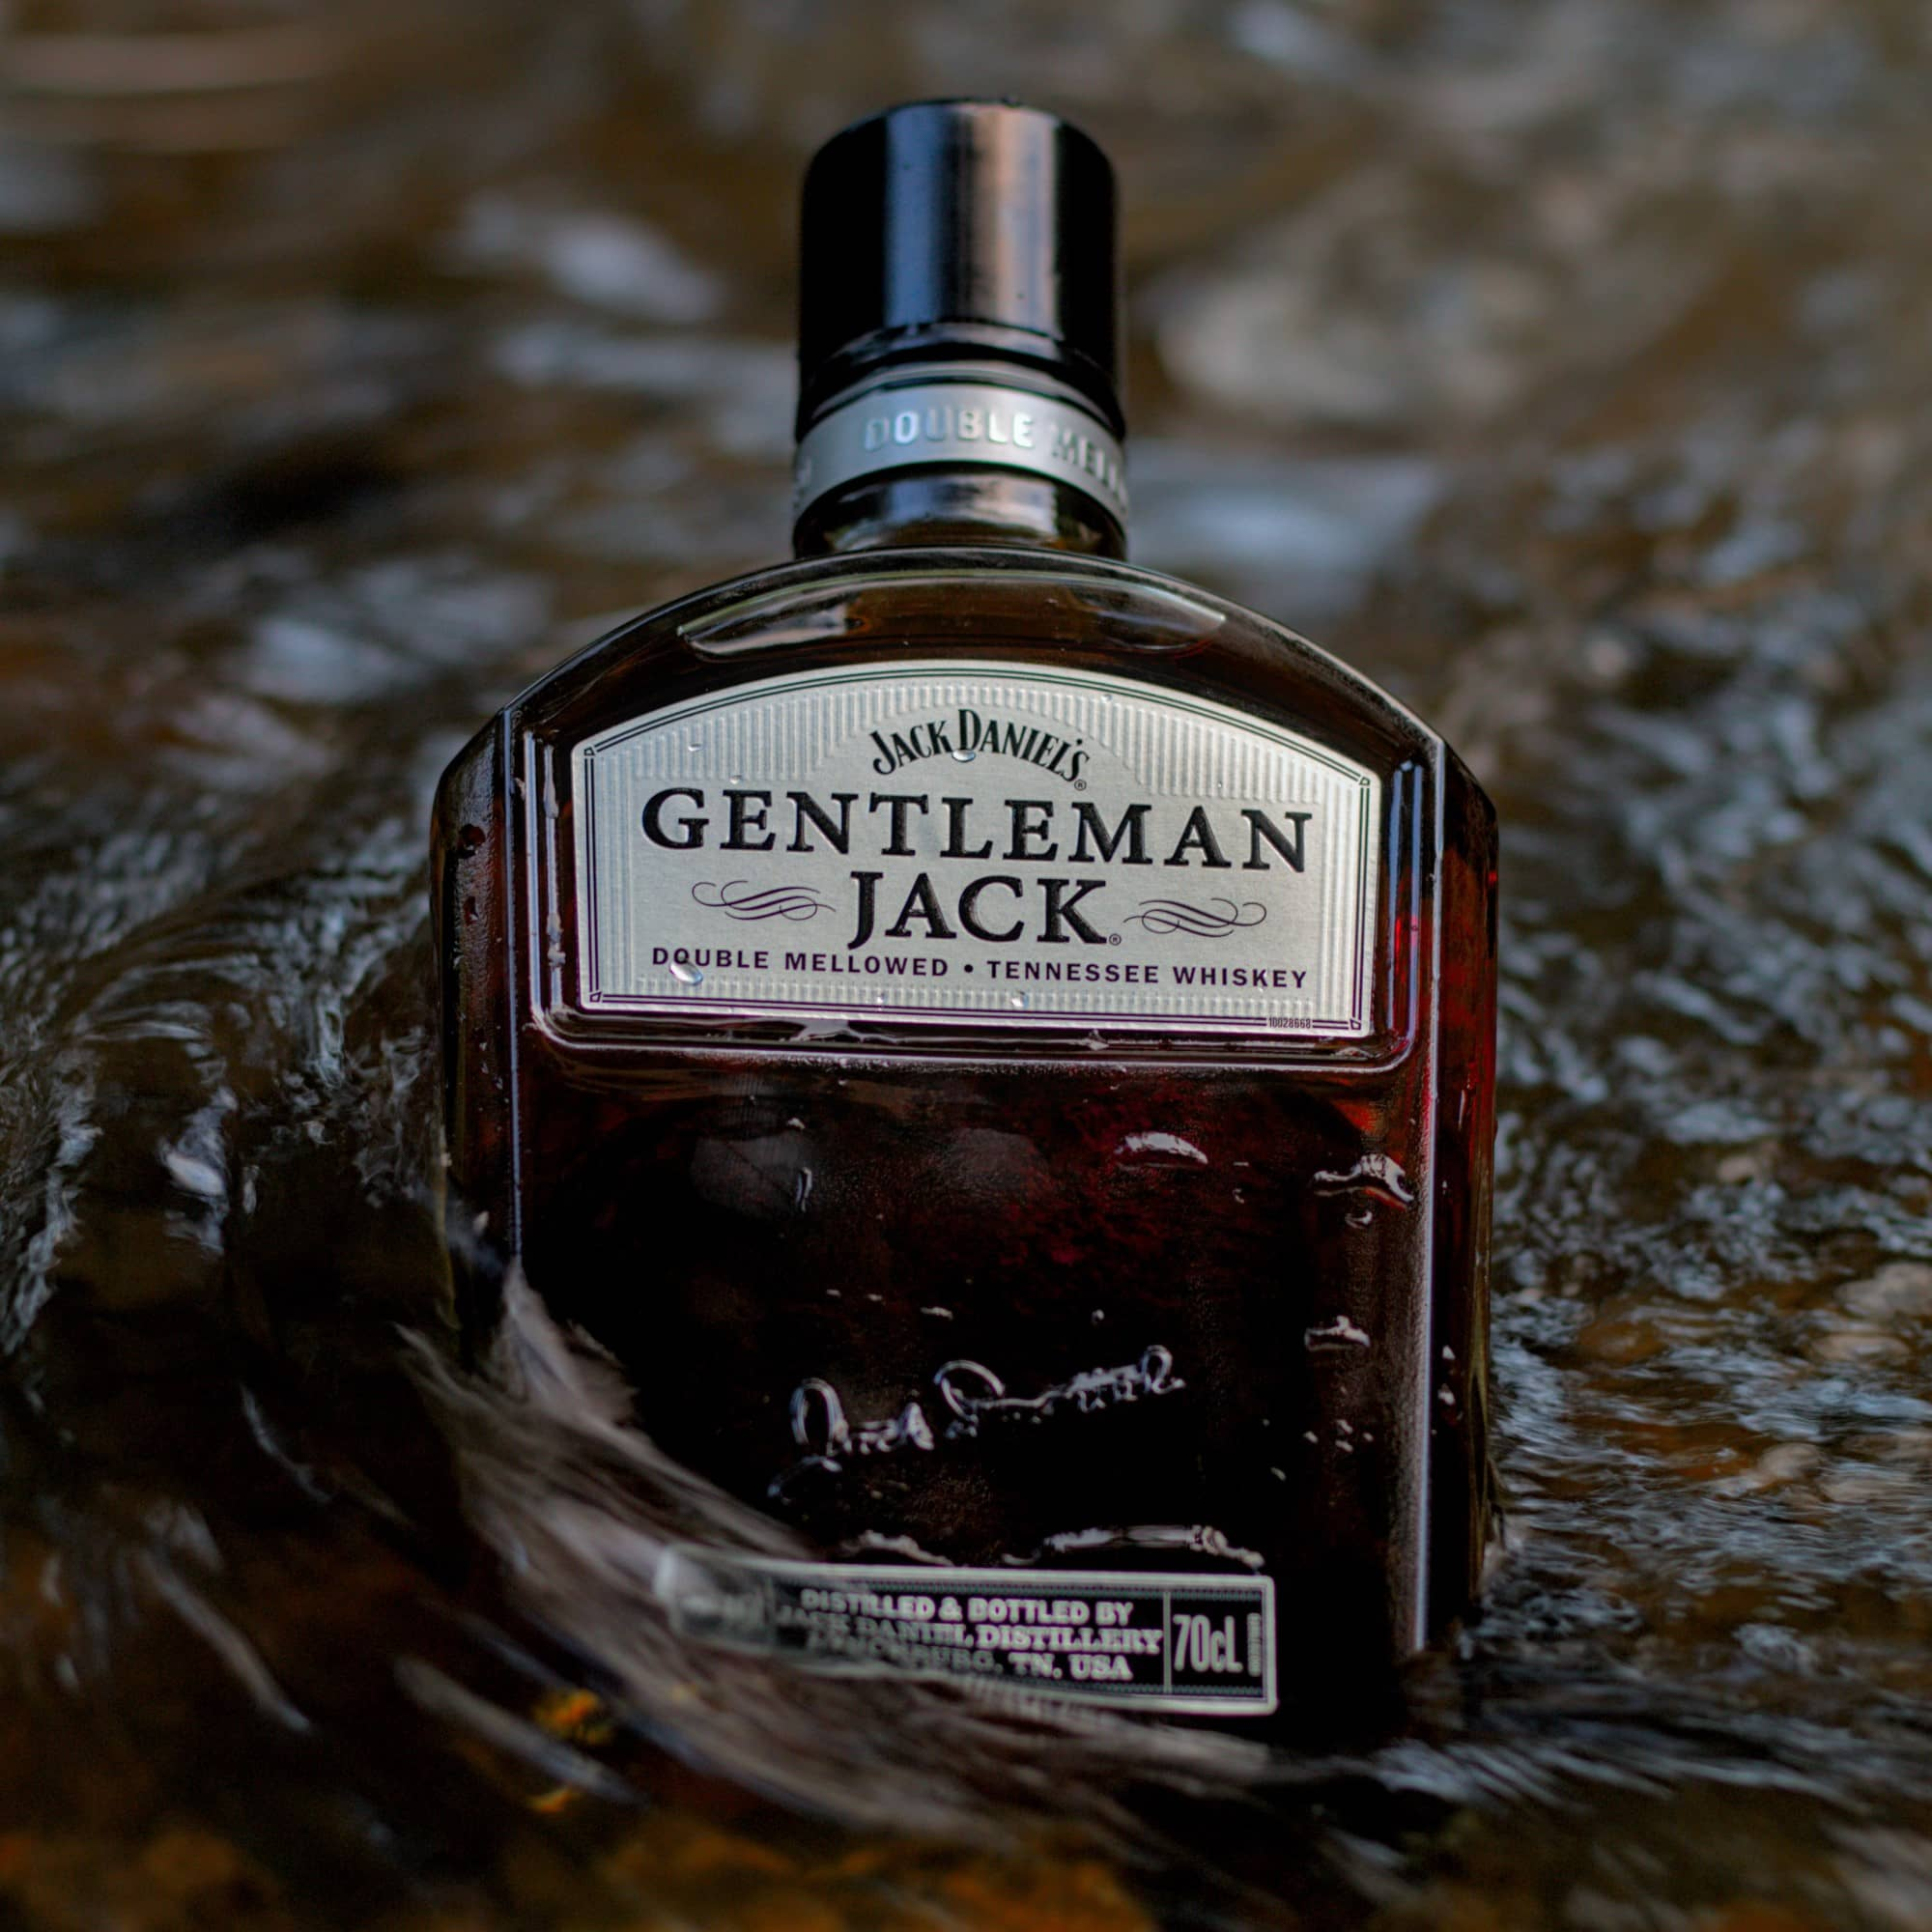 Bottle of Jack Daniels Gentleman Jack